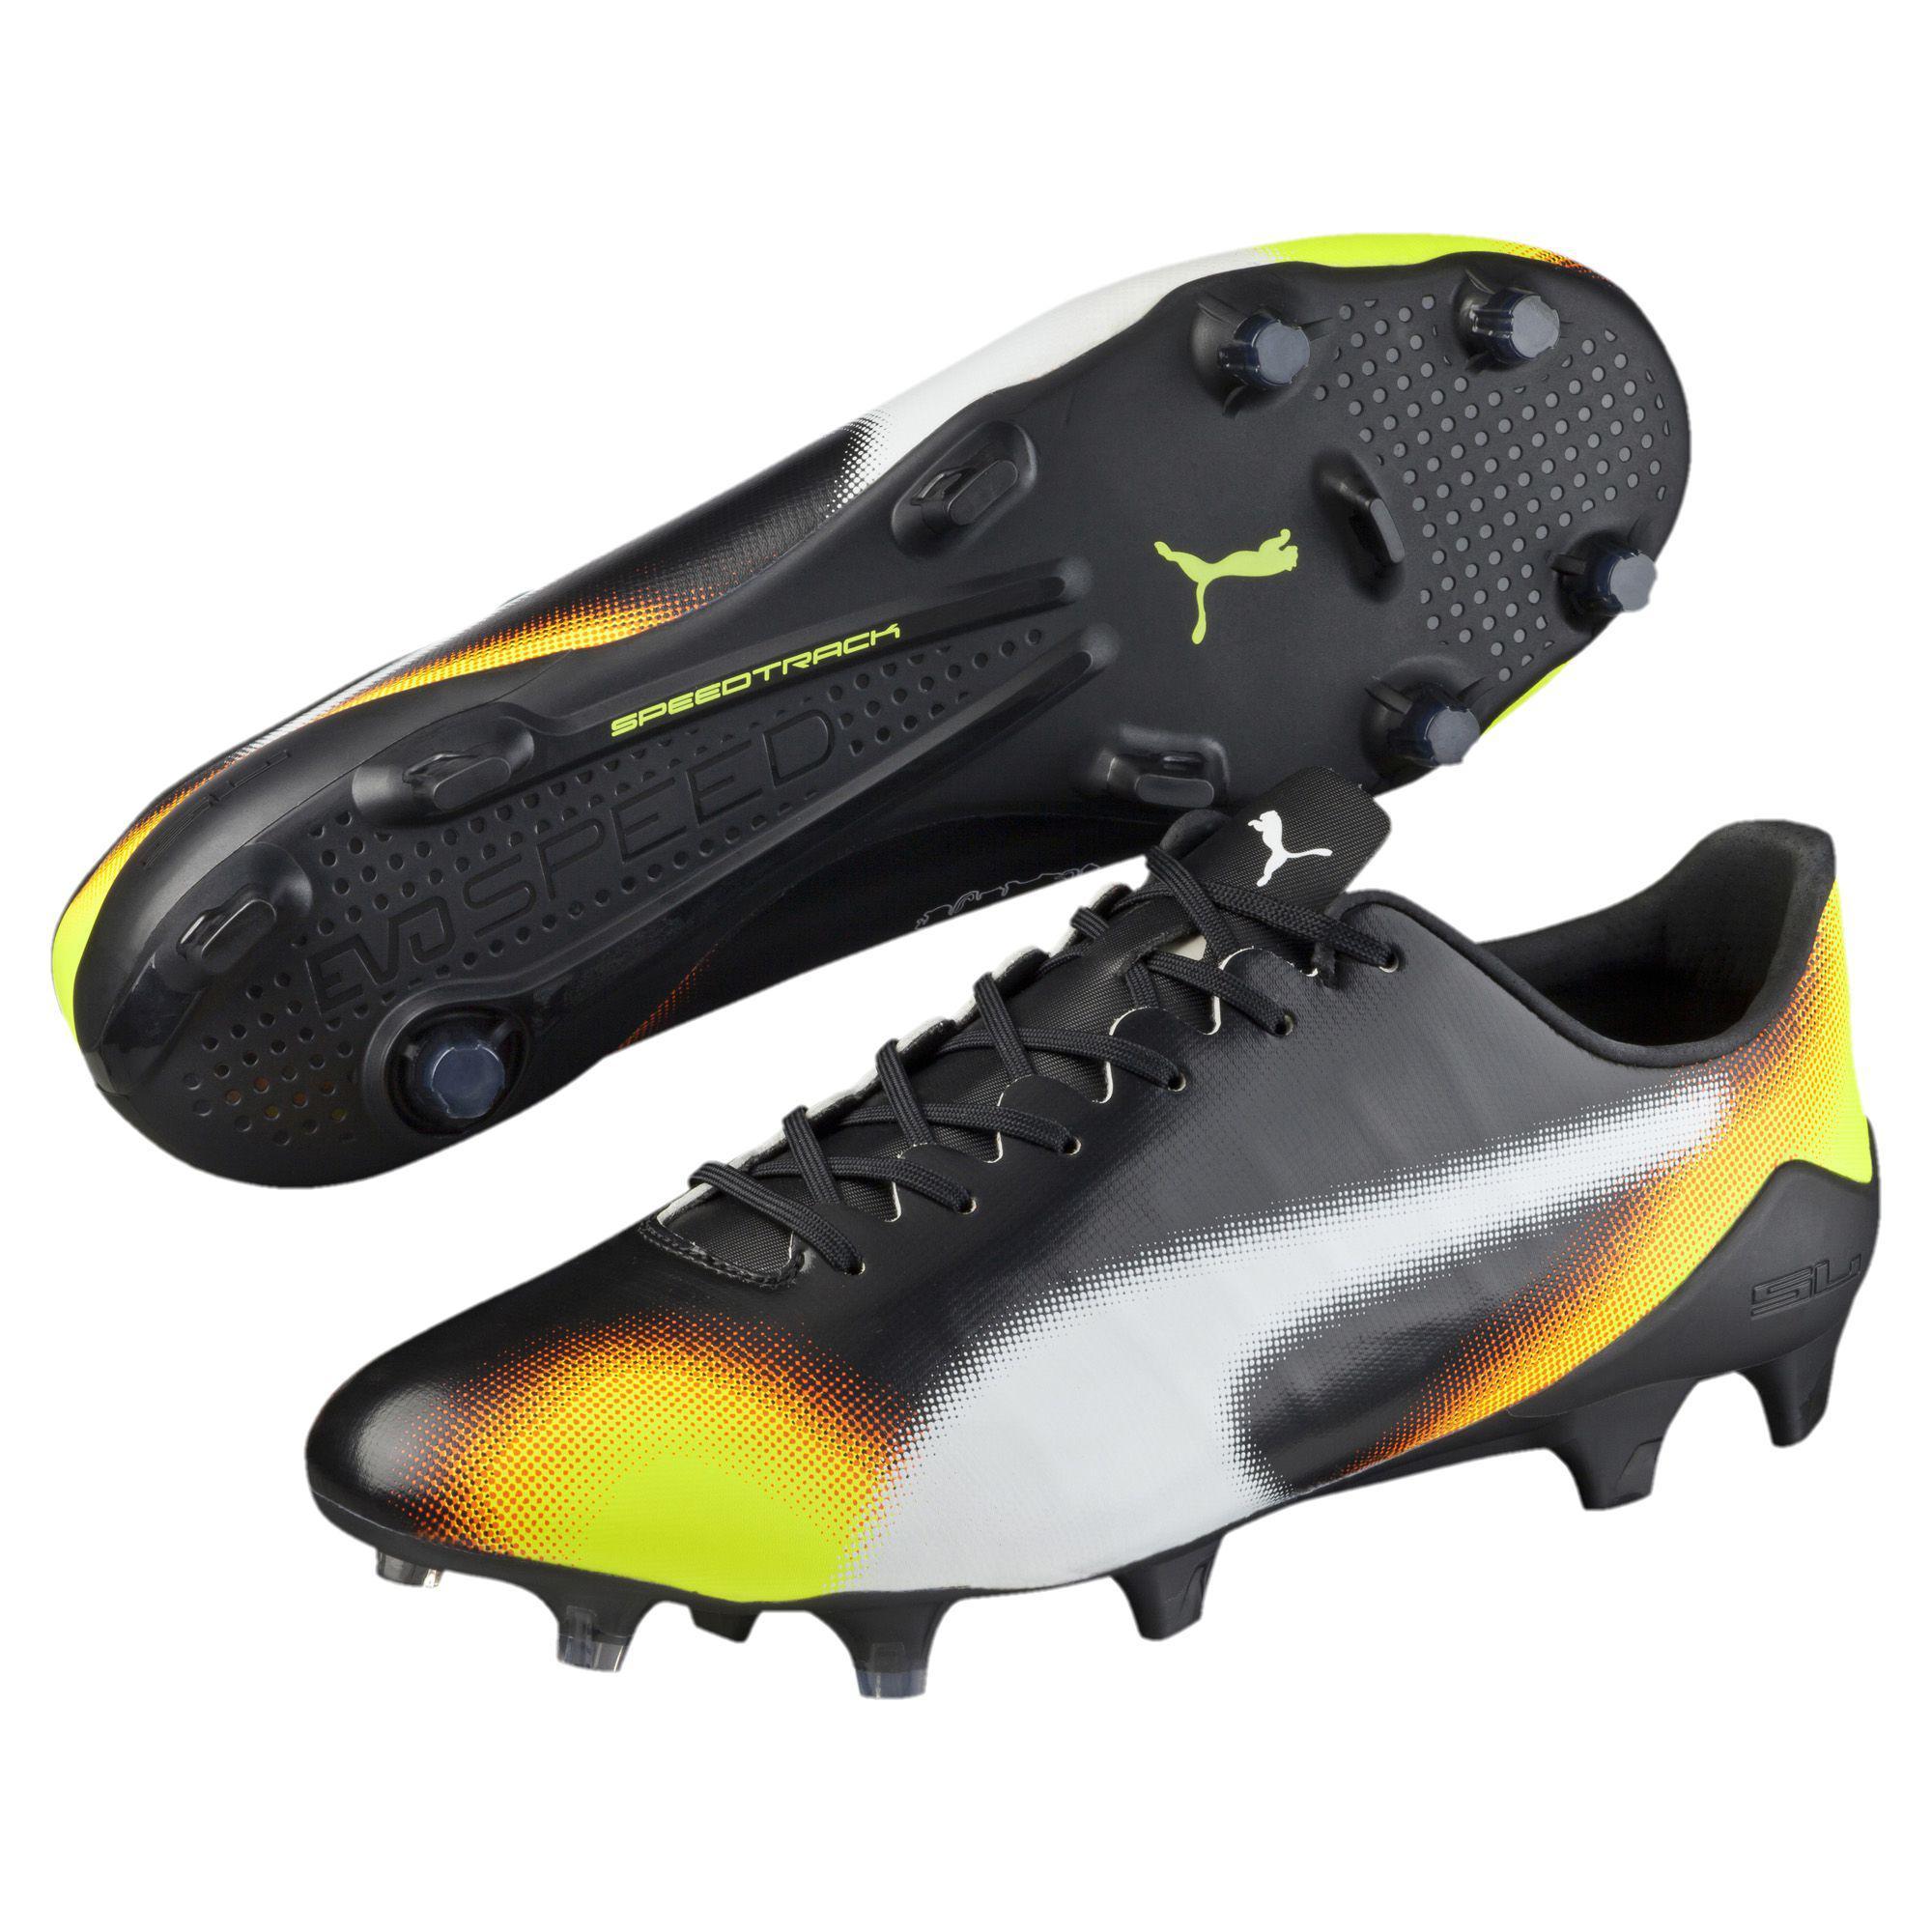 5829f84ff PUMA Evospeed Sl Ii Graphic Fg Men's Firm Ground Soccer Cleats - Lyst